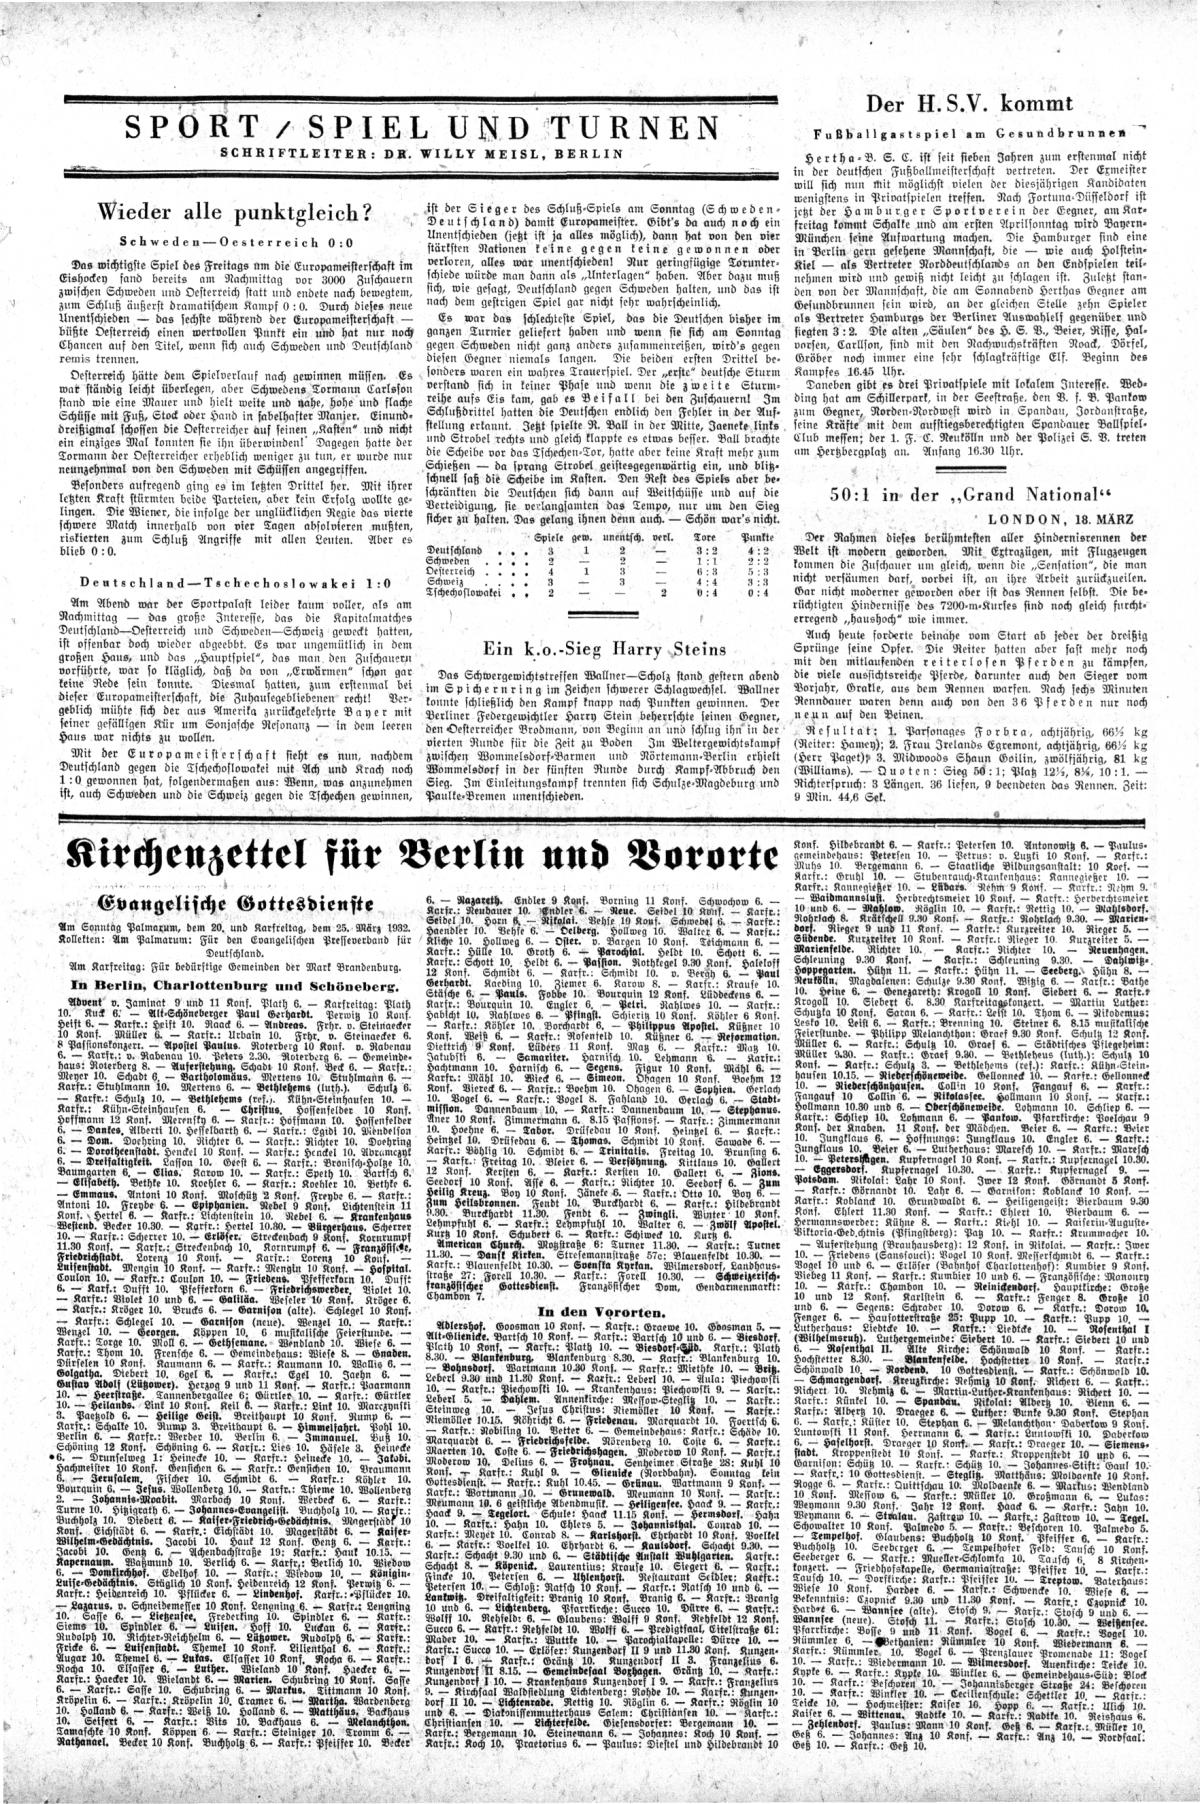 GER CZE 1932 from Vossische Zeitung.png